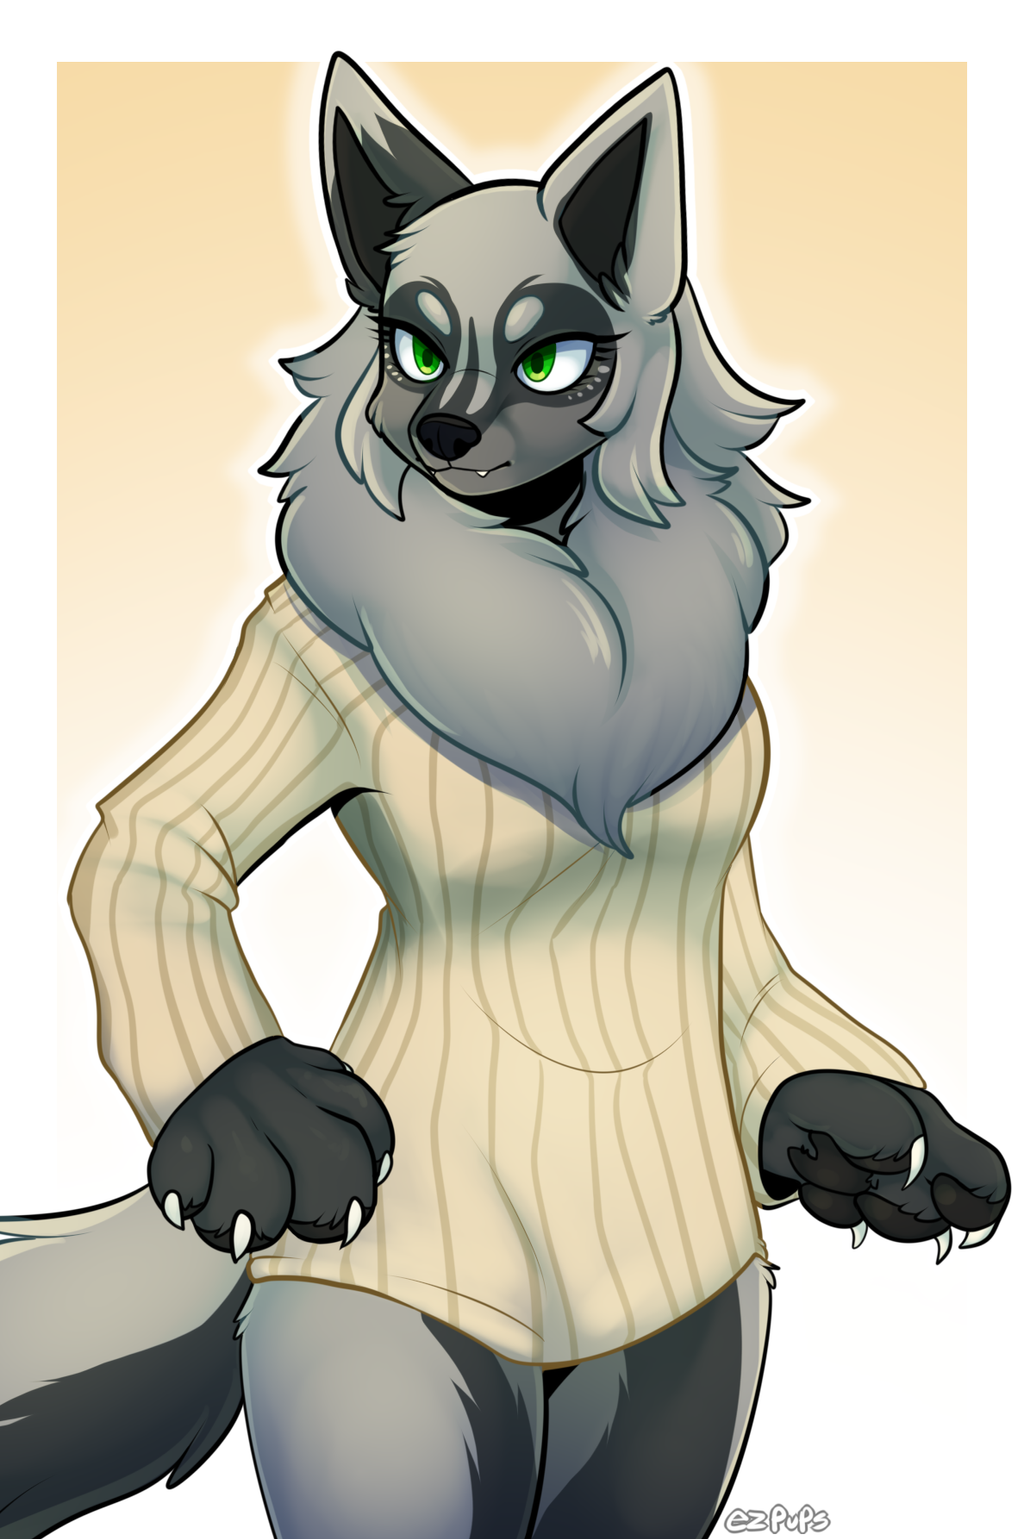 Sweater Doggo by ezpups